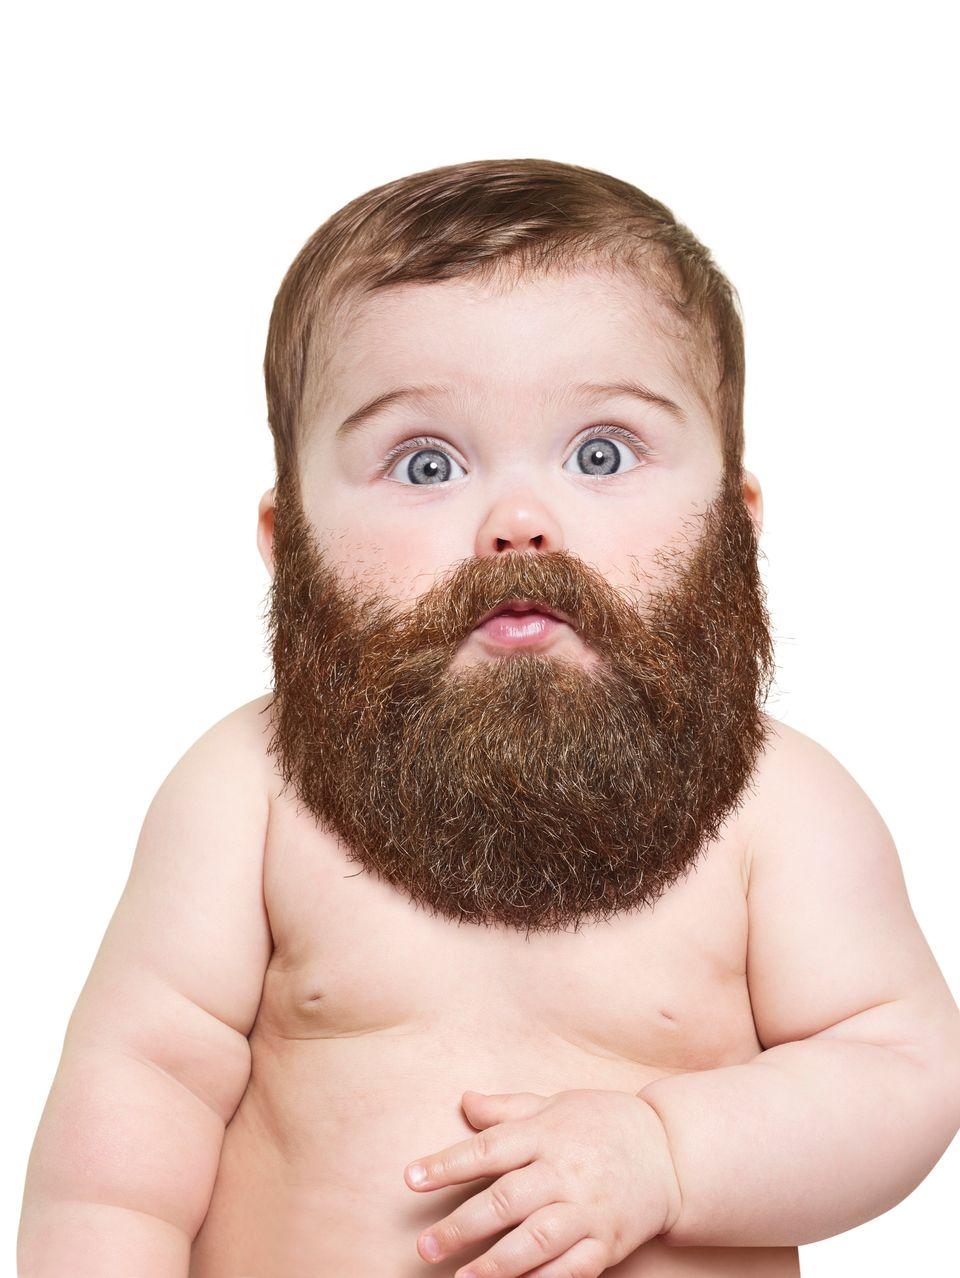 23af62c12 Stock Photos That Make Us Wish More Babies Had Beards   HuffPost Life